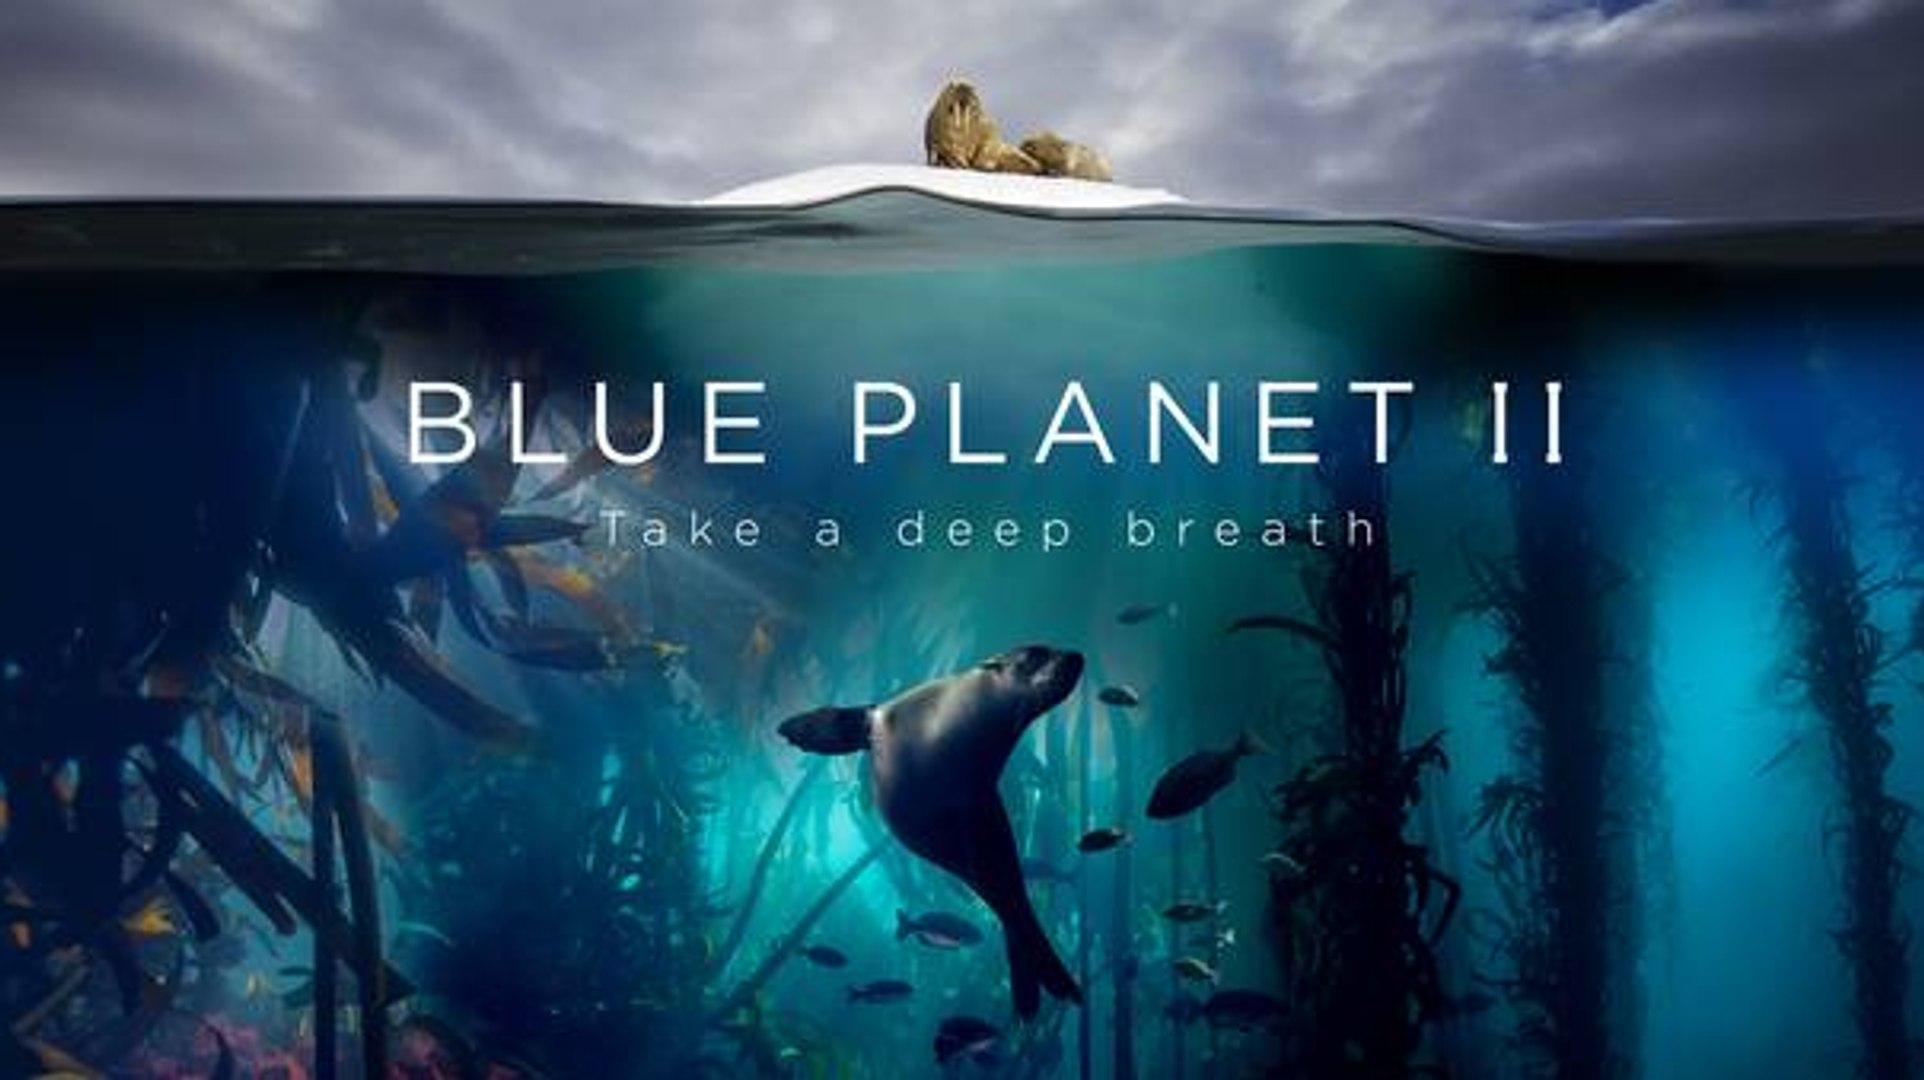 ((S1E07)) Blue Planet II Season 1 Episode 1-7 | BBC One | Documentary